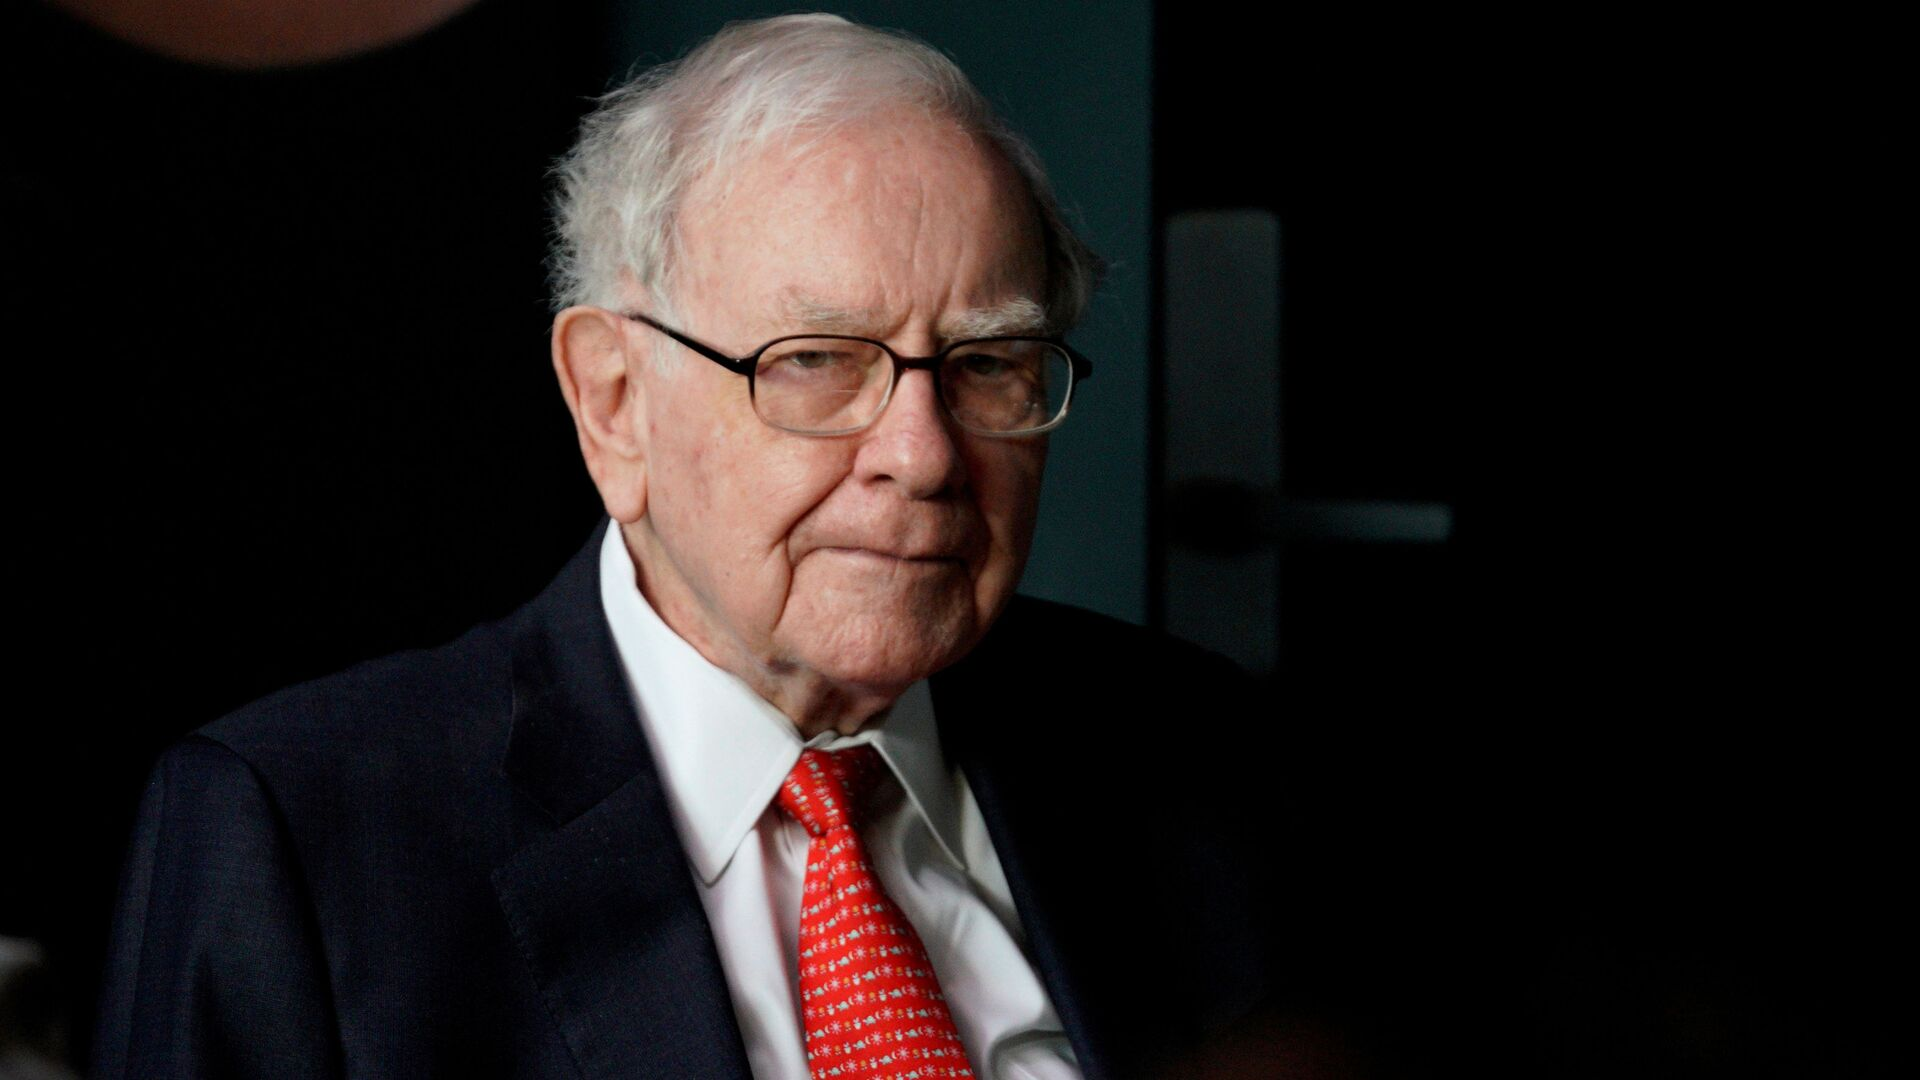 Warren Buffett, multimillonario estadounidense - Sputnik Mundo, 1920, 23.06.2021